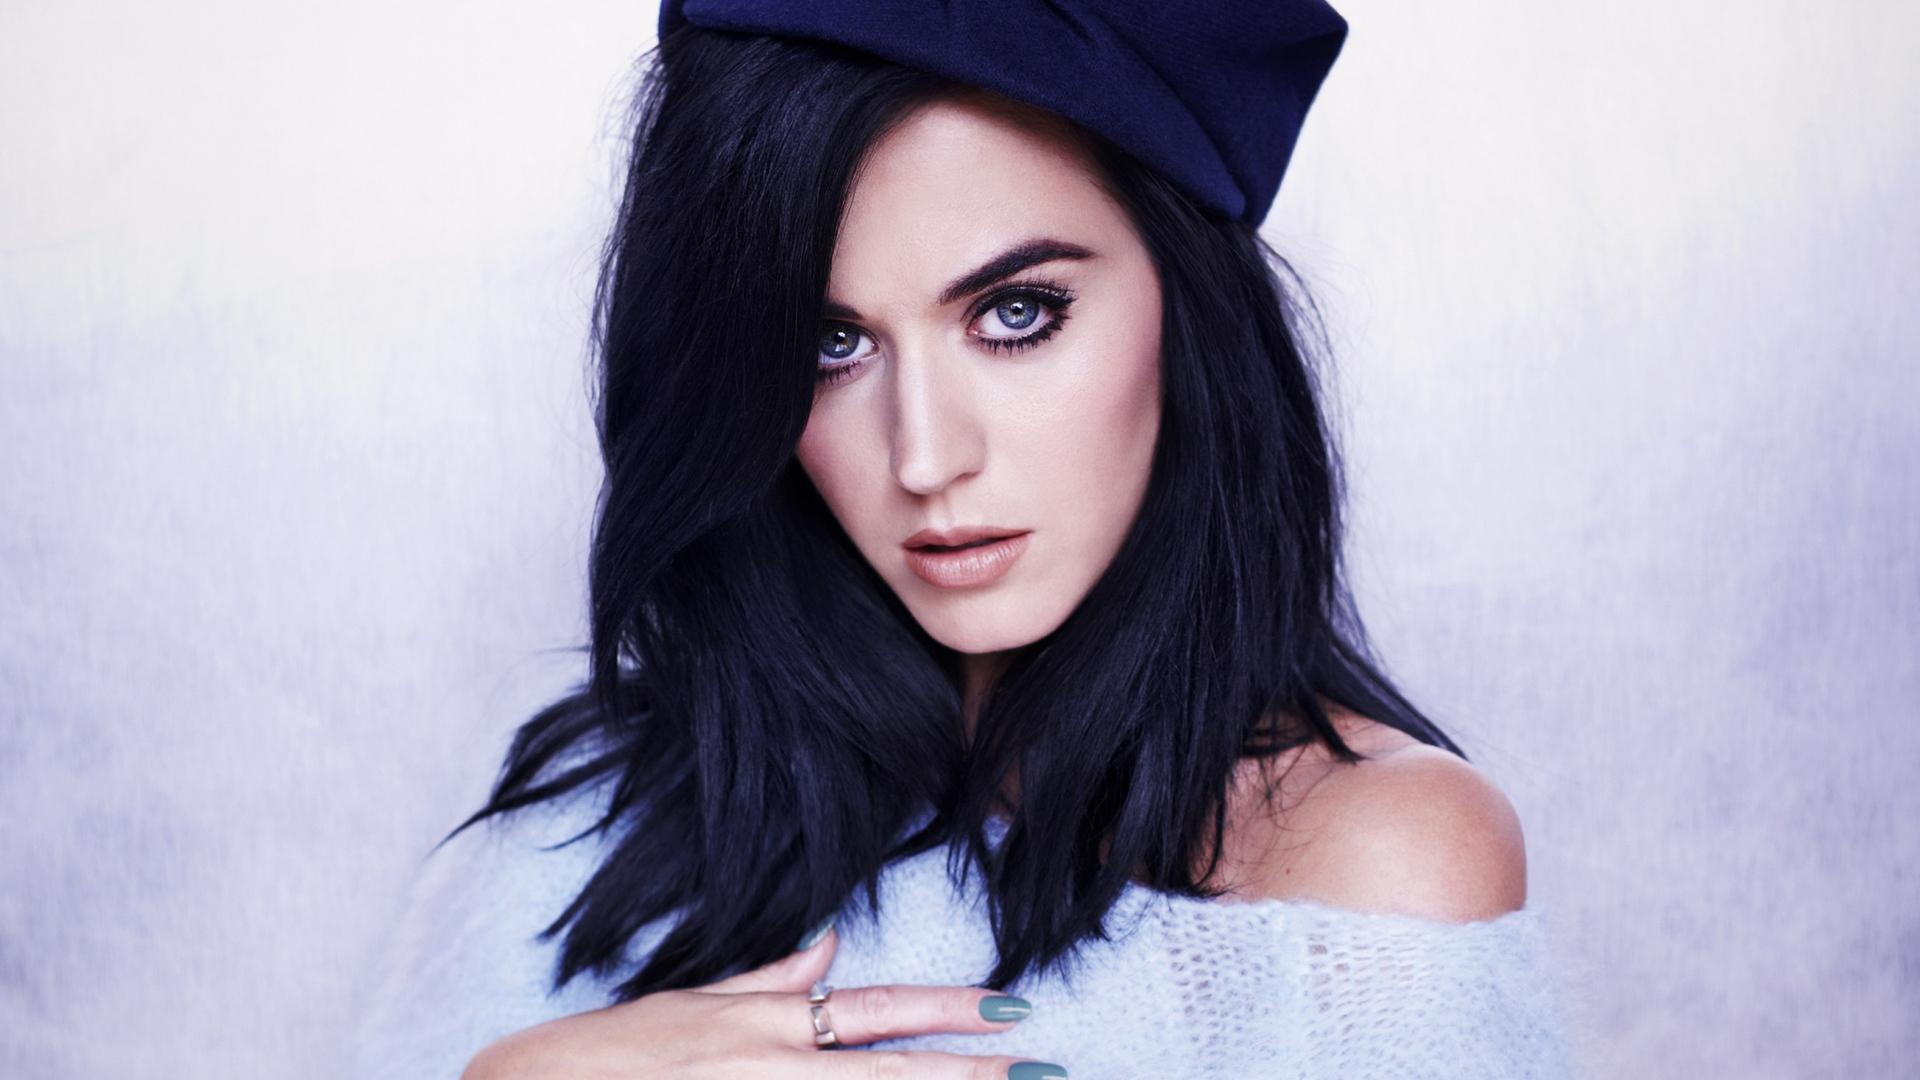 Katy Perry HD Deskto